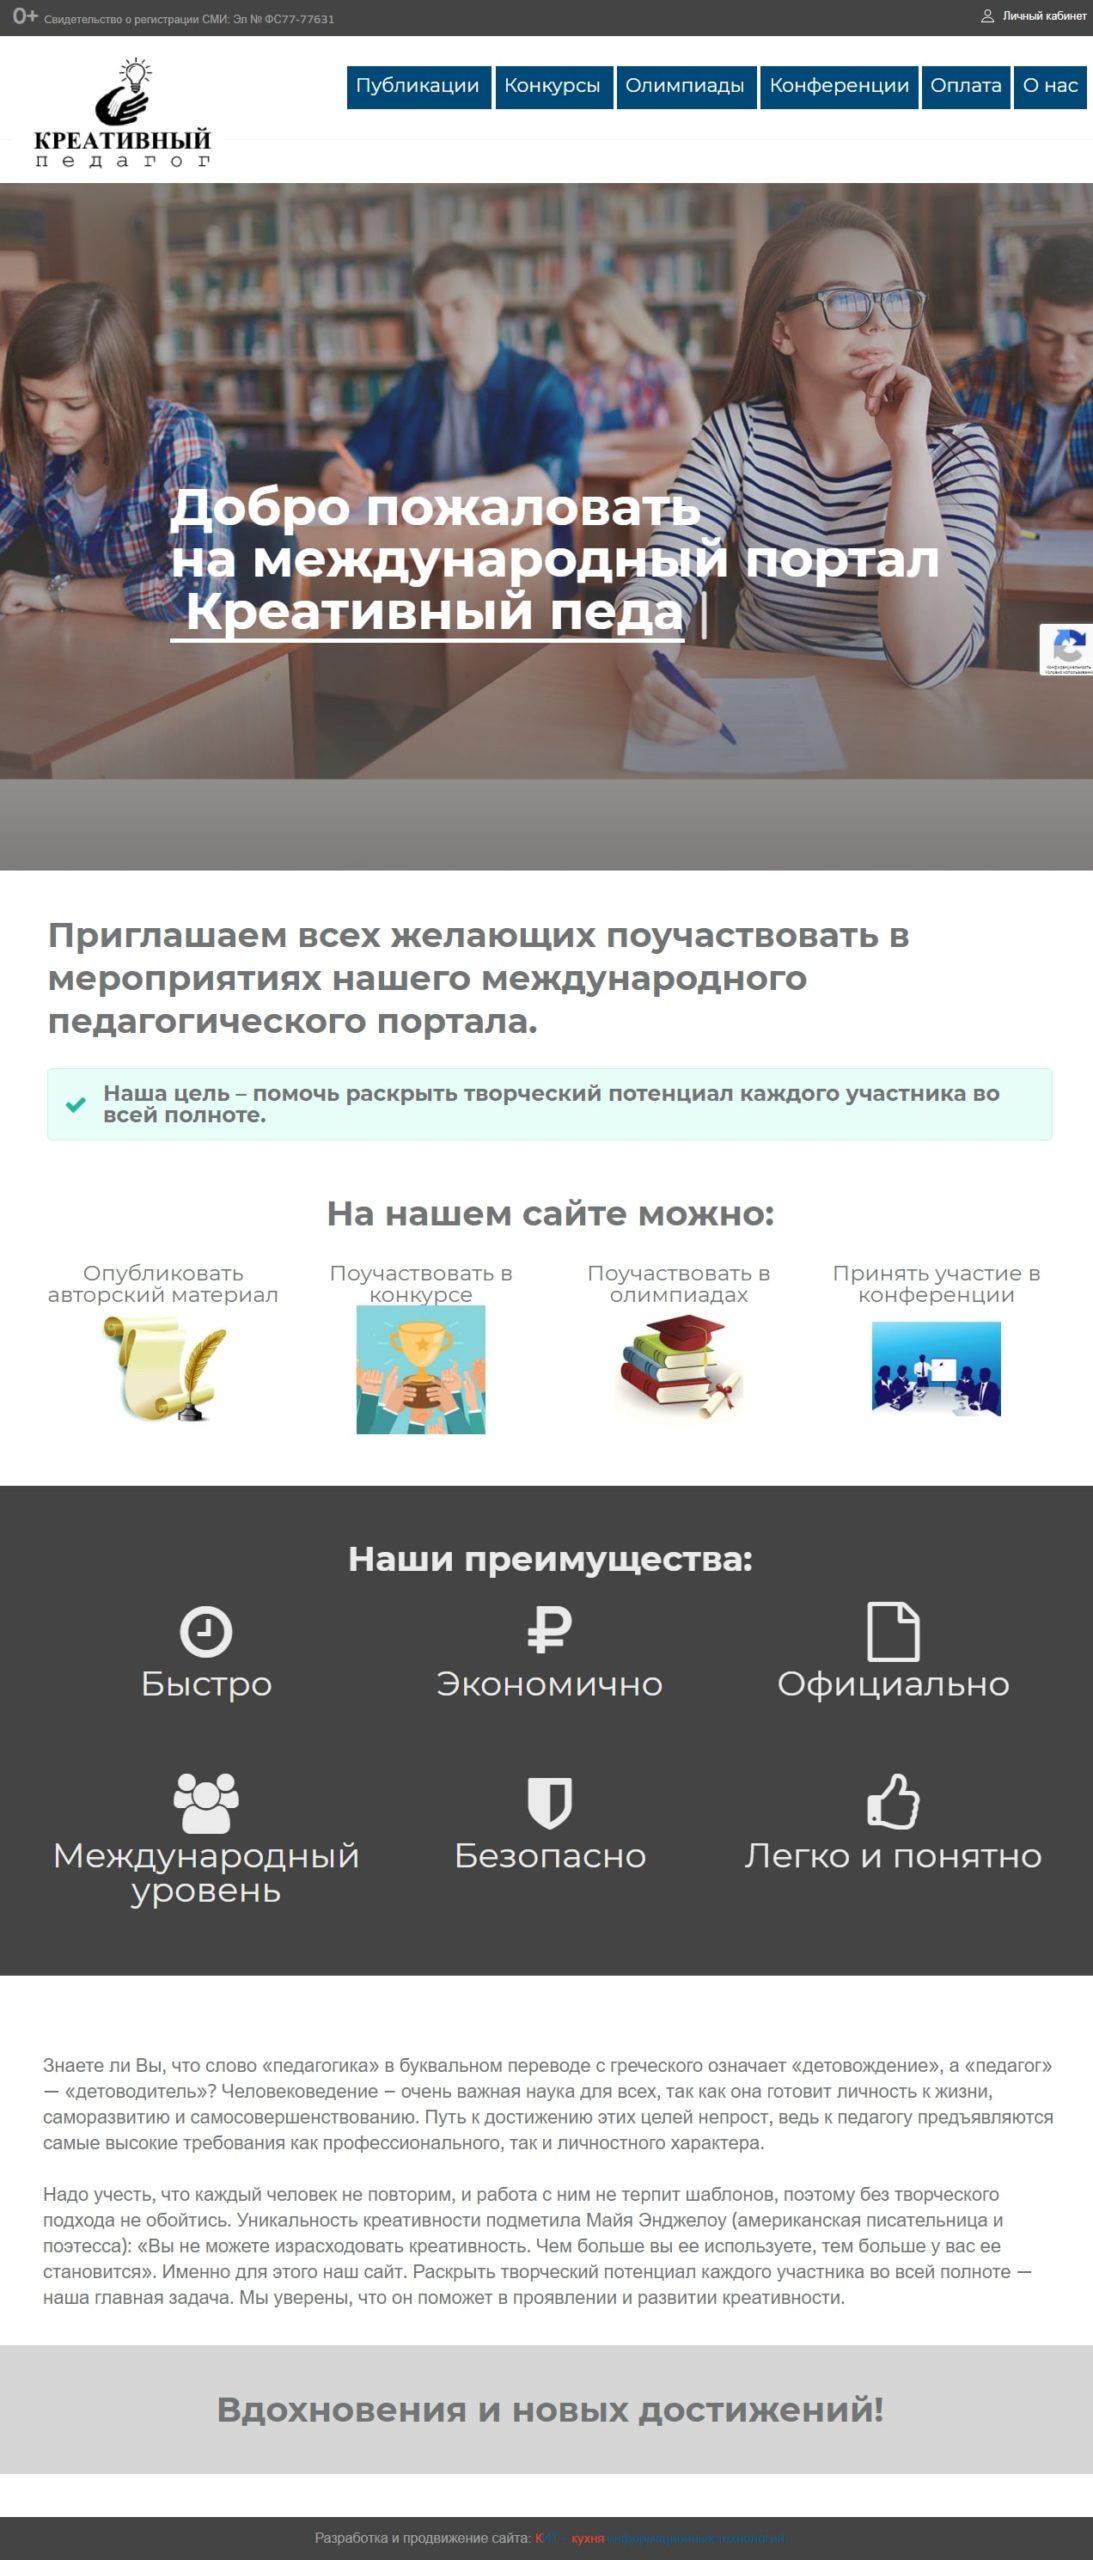 Сайт «Креативный педагог»